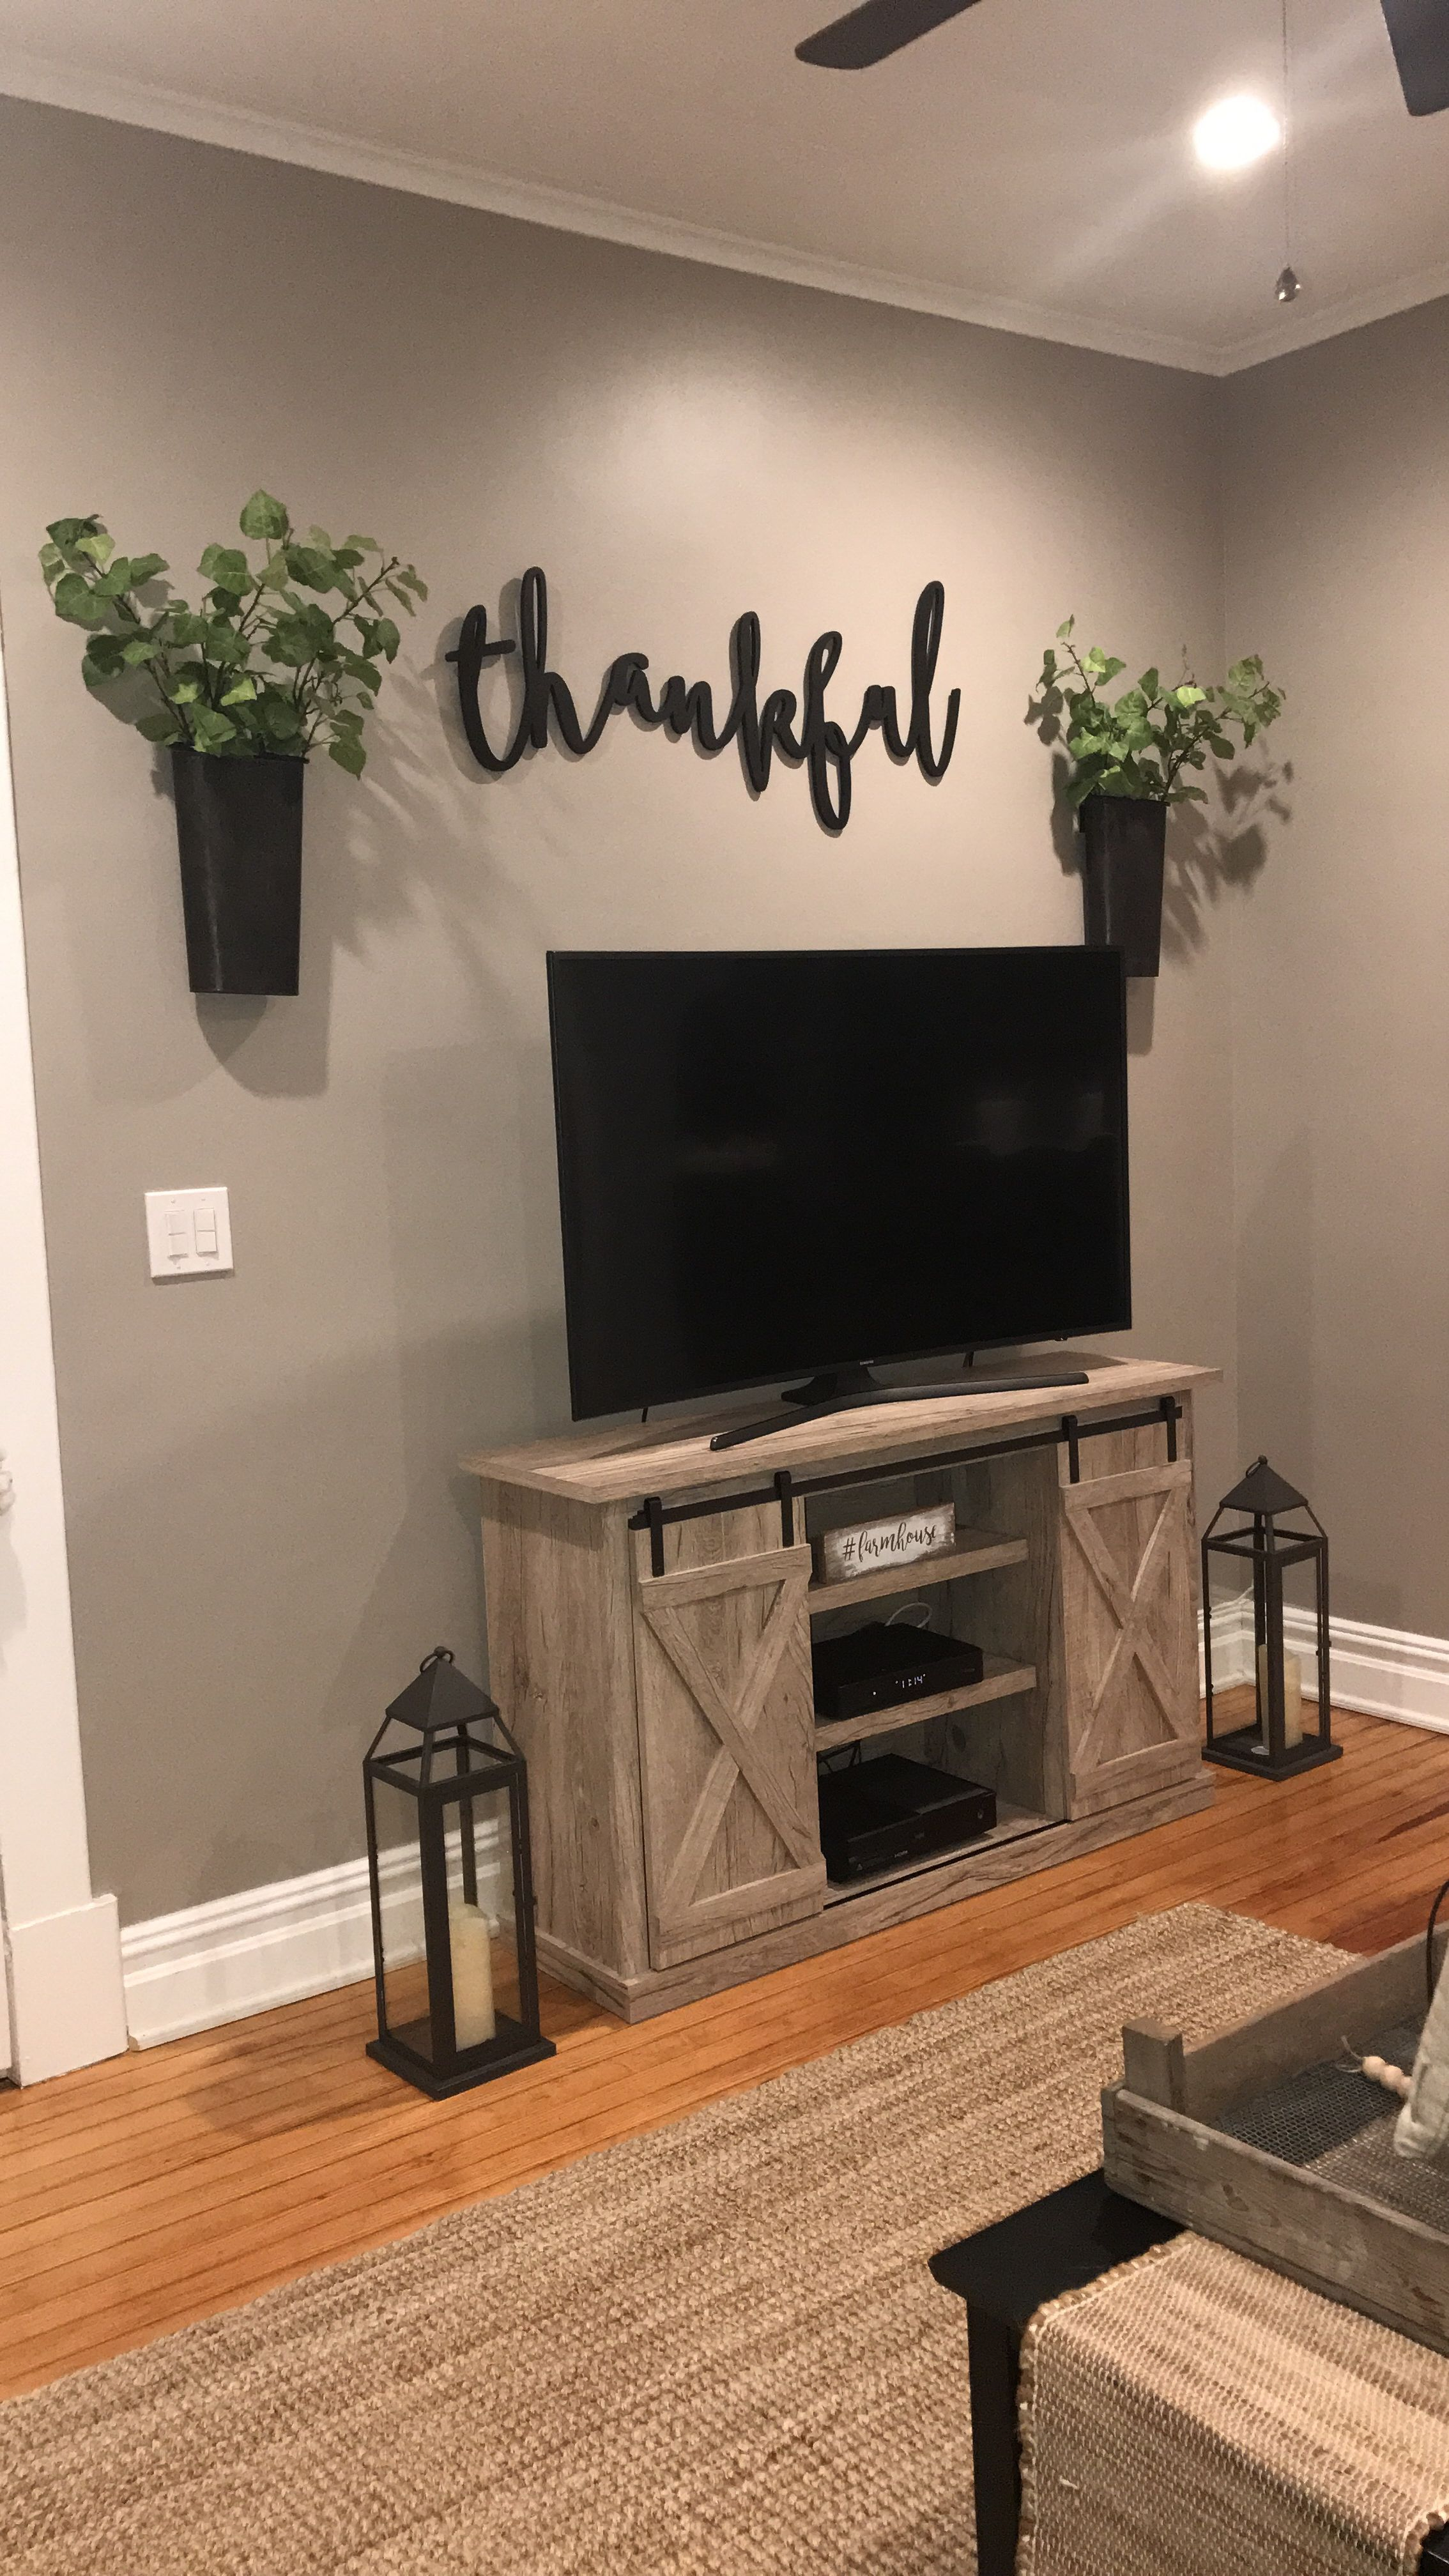 Feather and birch,thankful sign, tv area, farmhouse decor